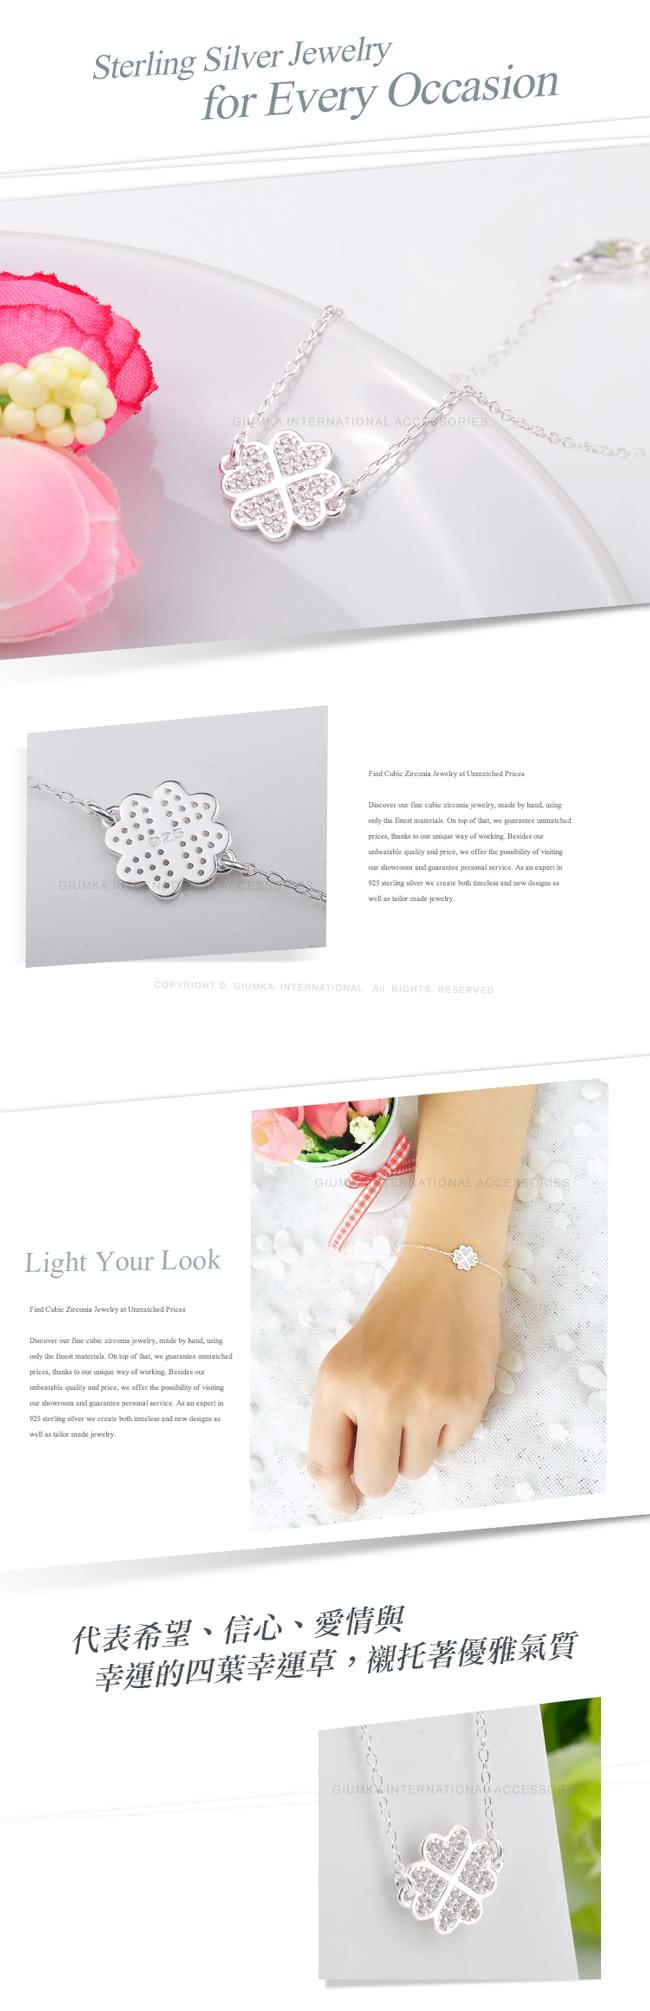 【GIUMKA】純銀手鍊 幸運草纏綿手鍊 925純銀 MHS06003(銀色)